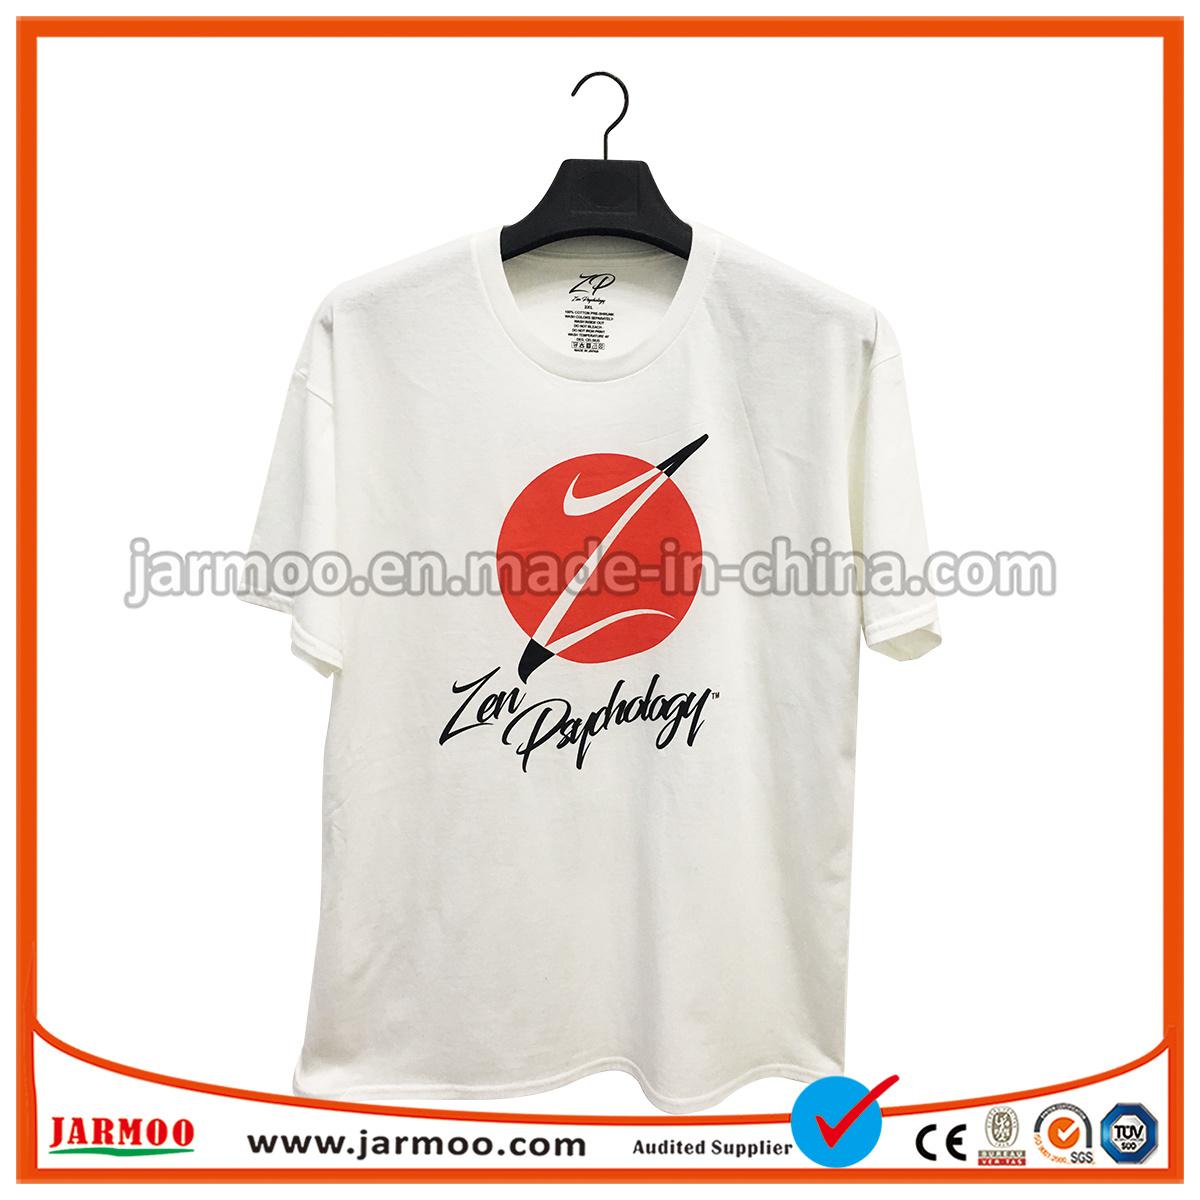 China Hot Selling Custom Cotton Shirt Clothing Printing Short Sleeve